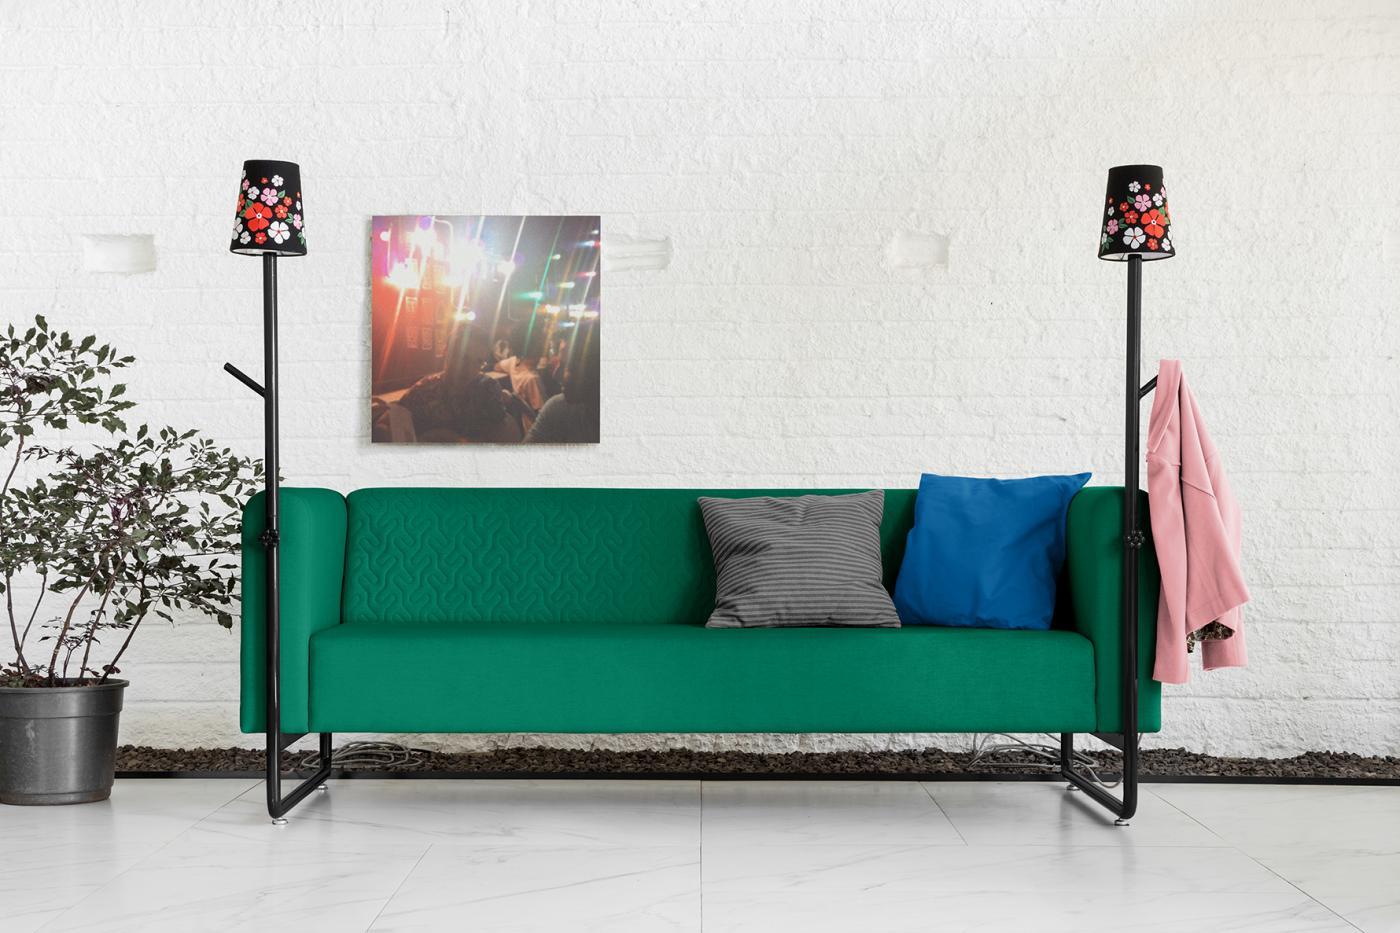 4784-sofa-pk9-studio-paulo-kobylka-5-1400